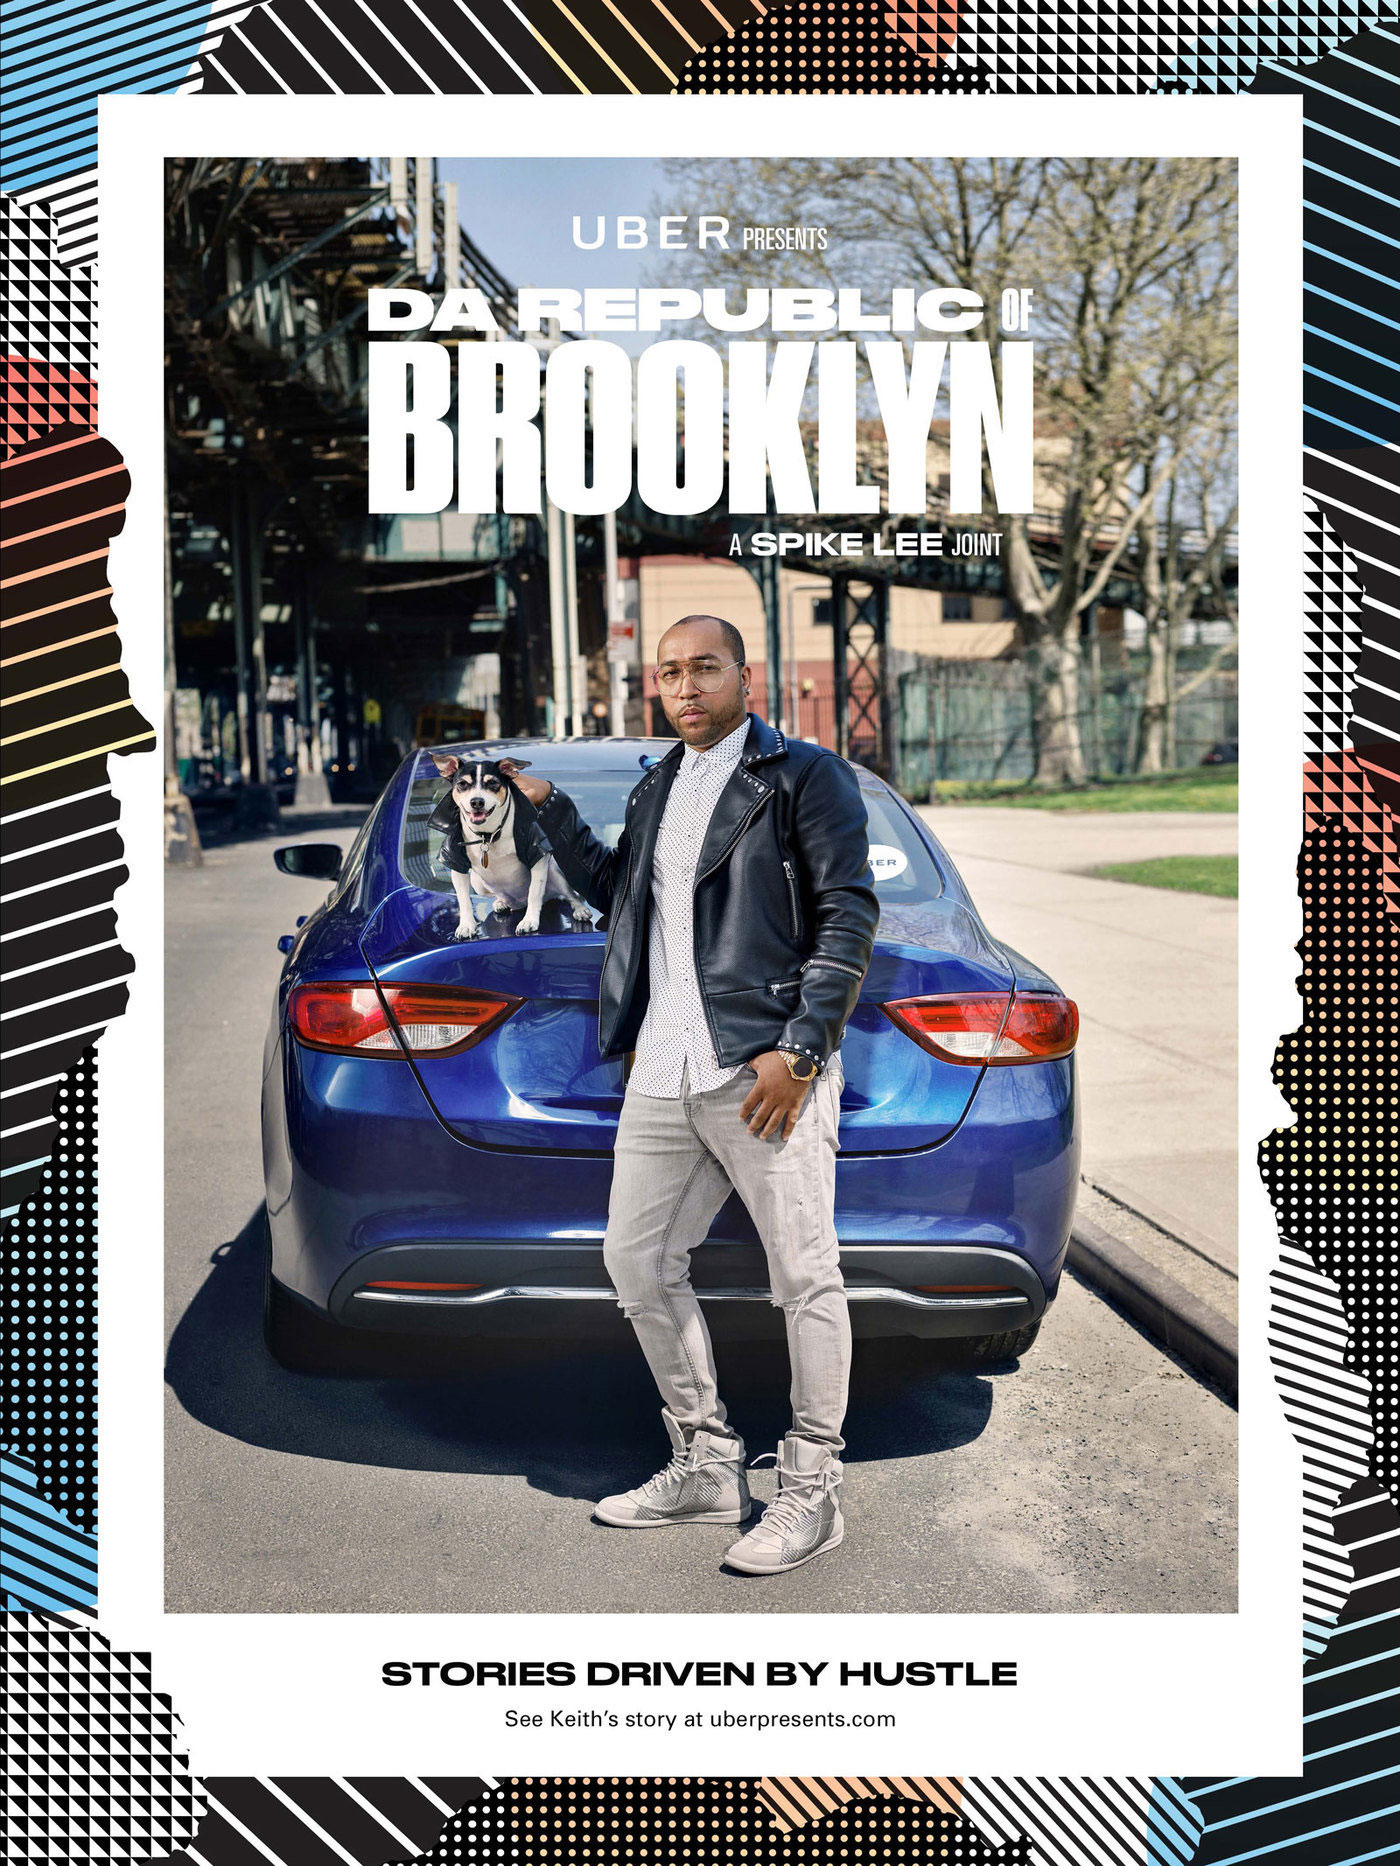 Wayne Lawrence Uber - Da Republic of Brooklyn